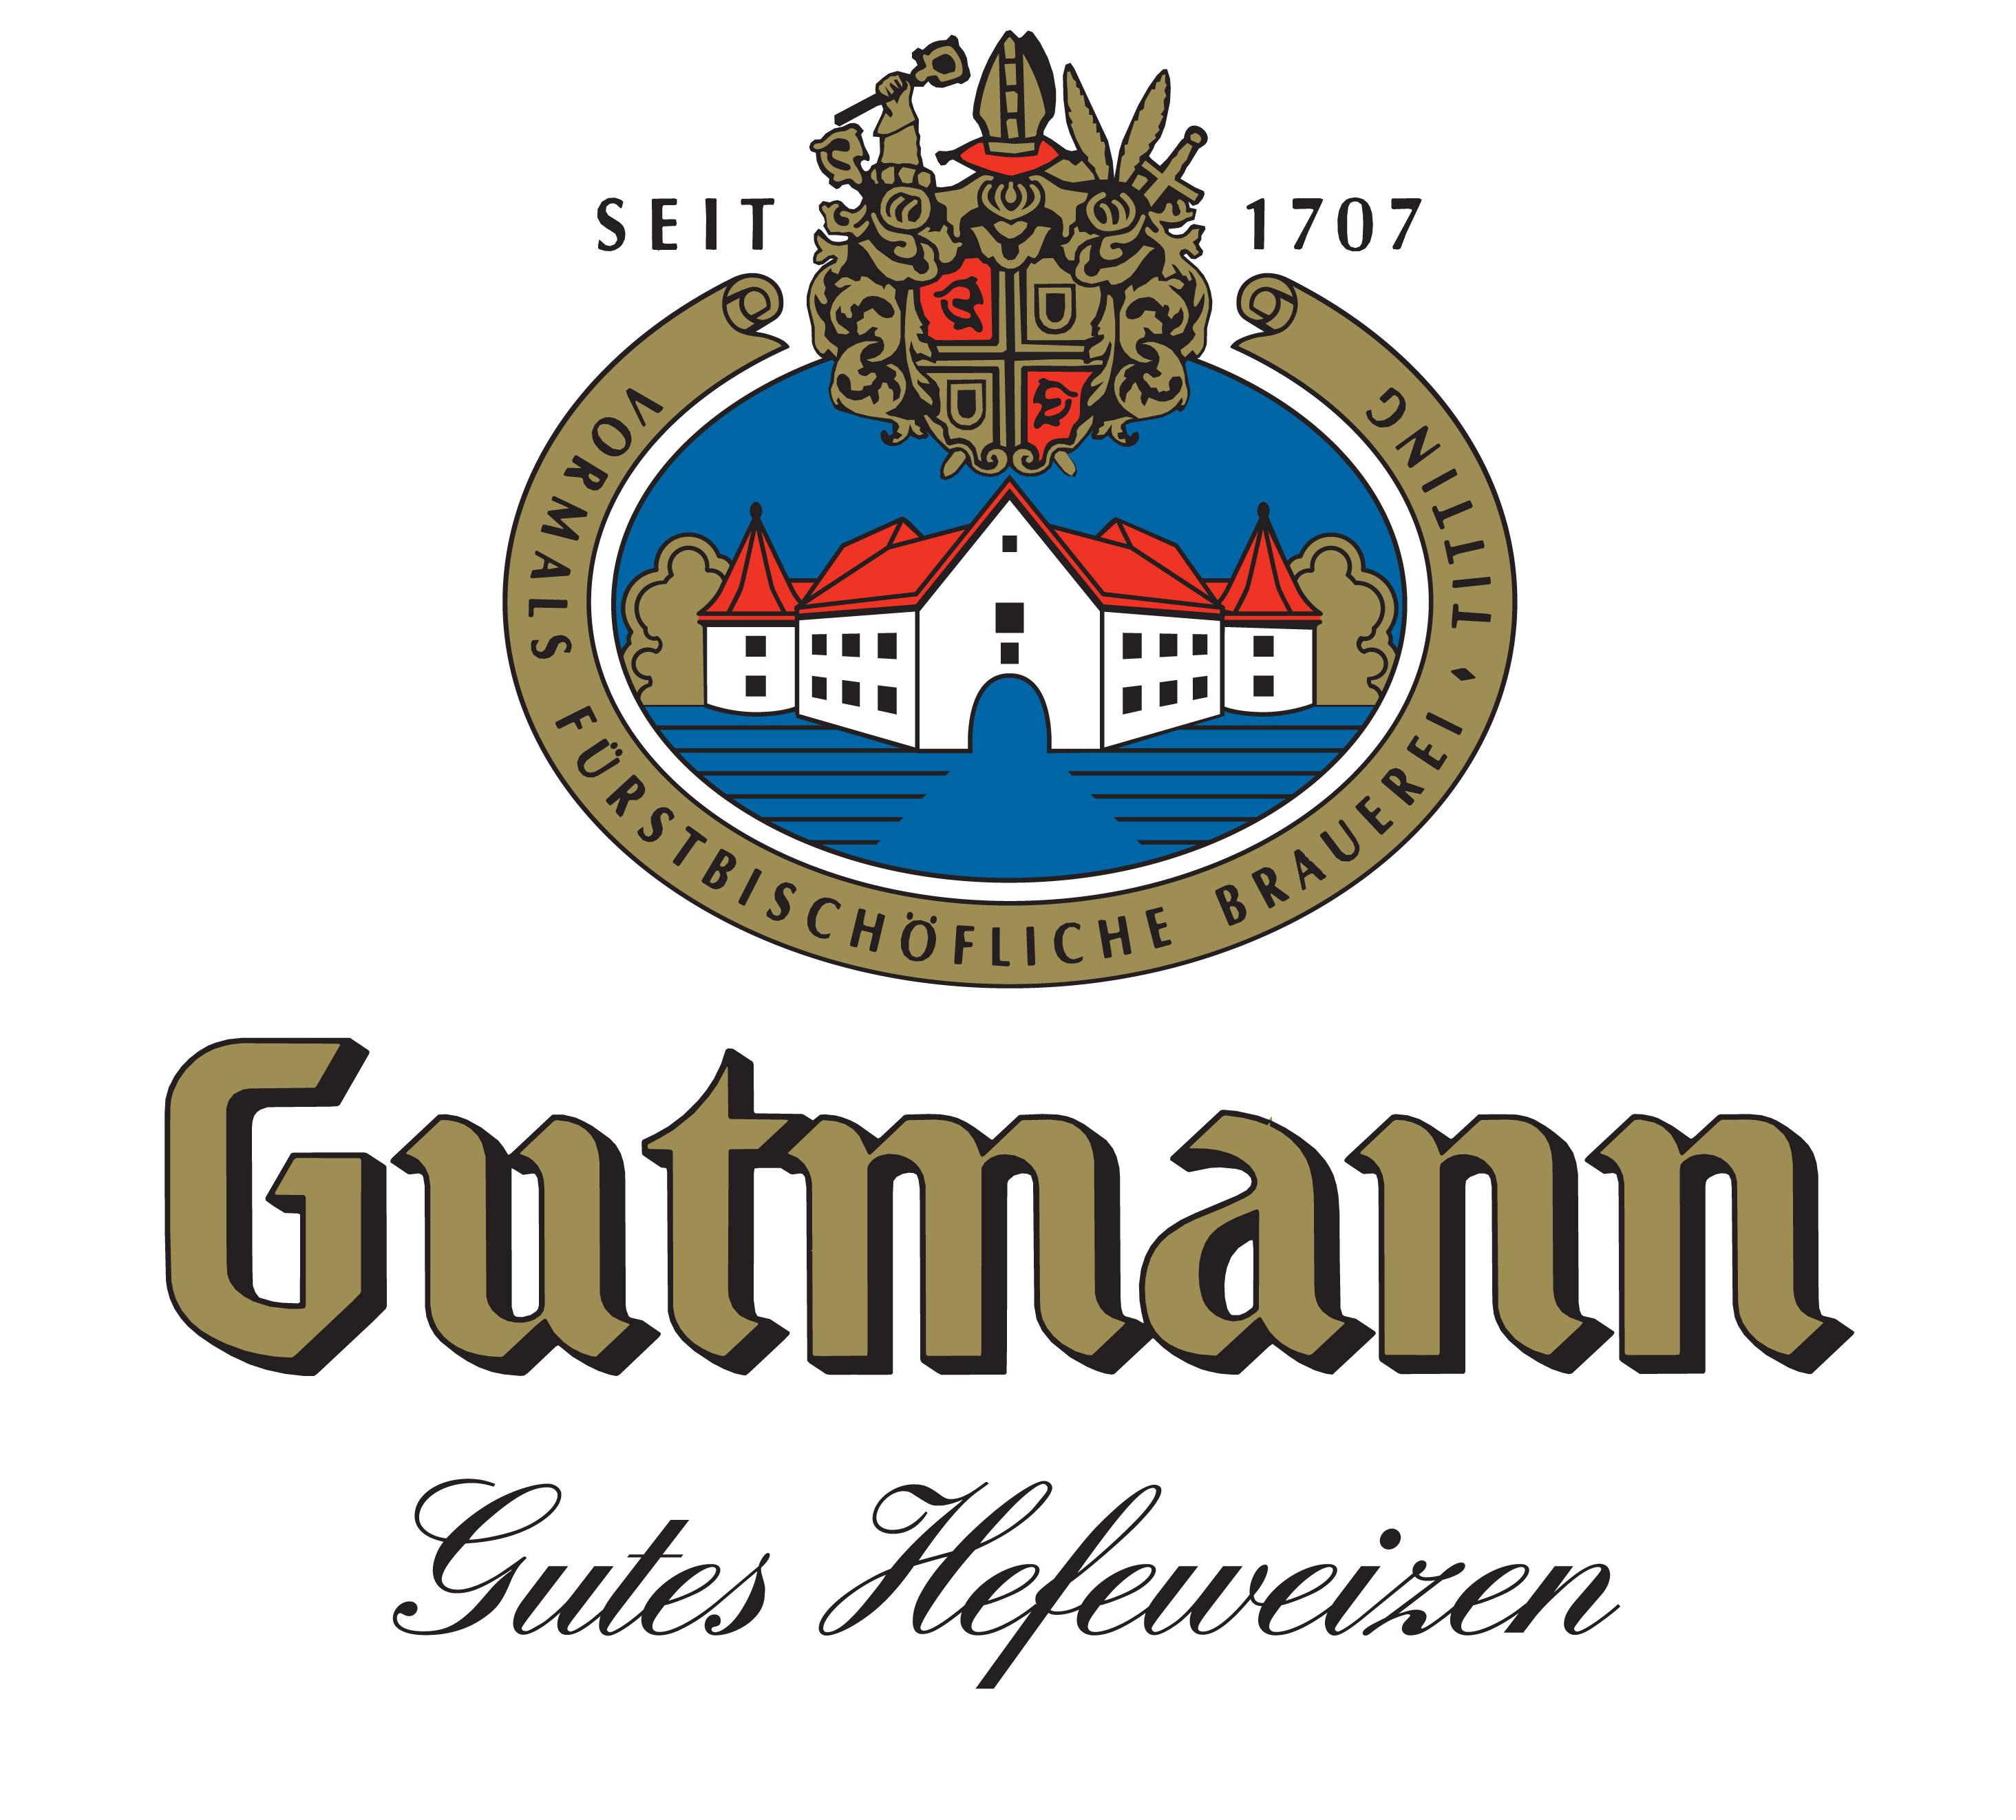 Brauerei Gutmann - Logo